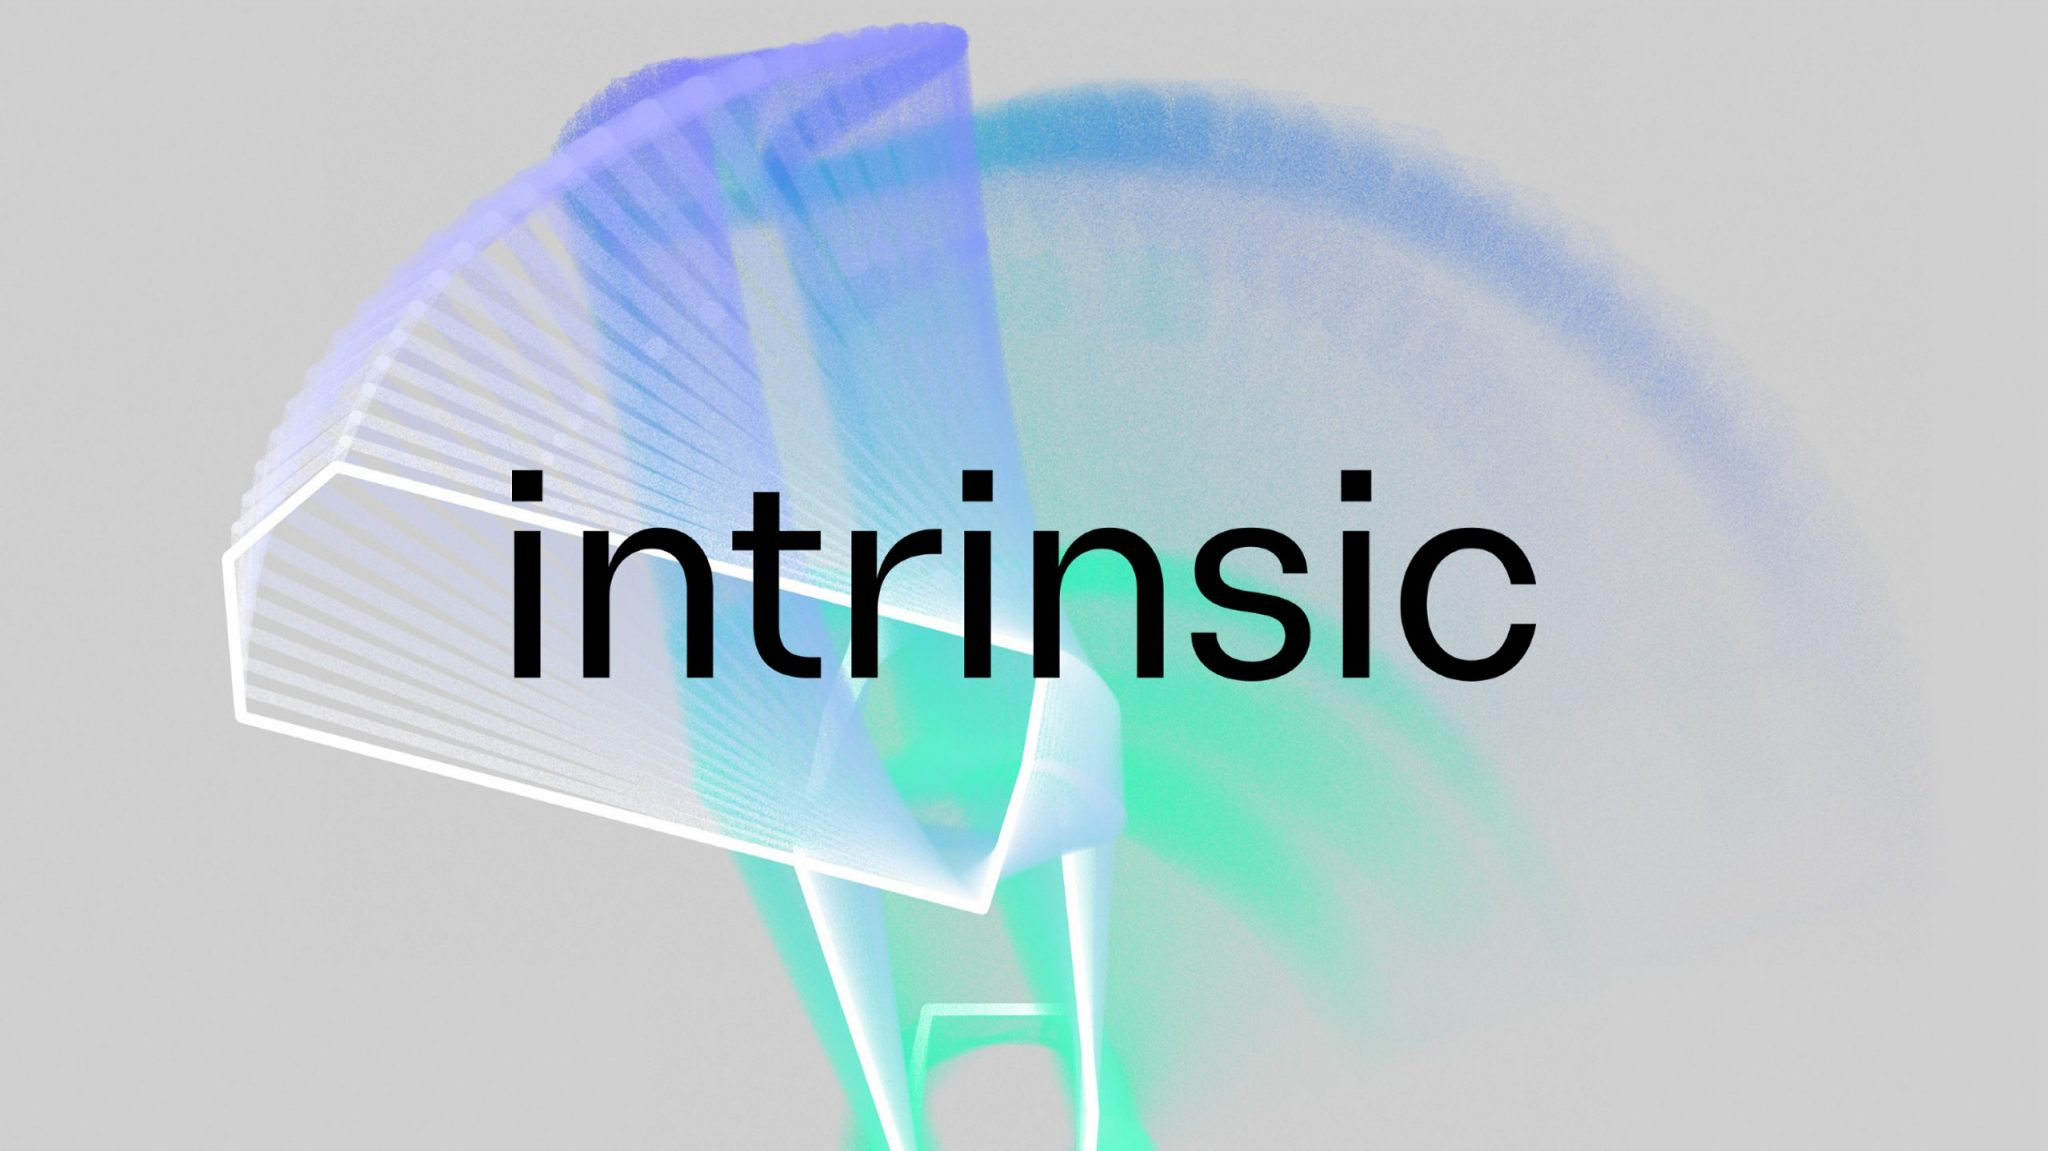 Alphabet to launch a new Robotics Company called Intrinsic | இன்ட்ரான்சிக் என்ற புதிய ரோபாட்டிக்ஸ் நிறுவனத்தை ஆல்பாபெட் தொடங்கியுள்ளது |_40.1